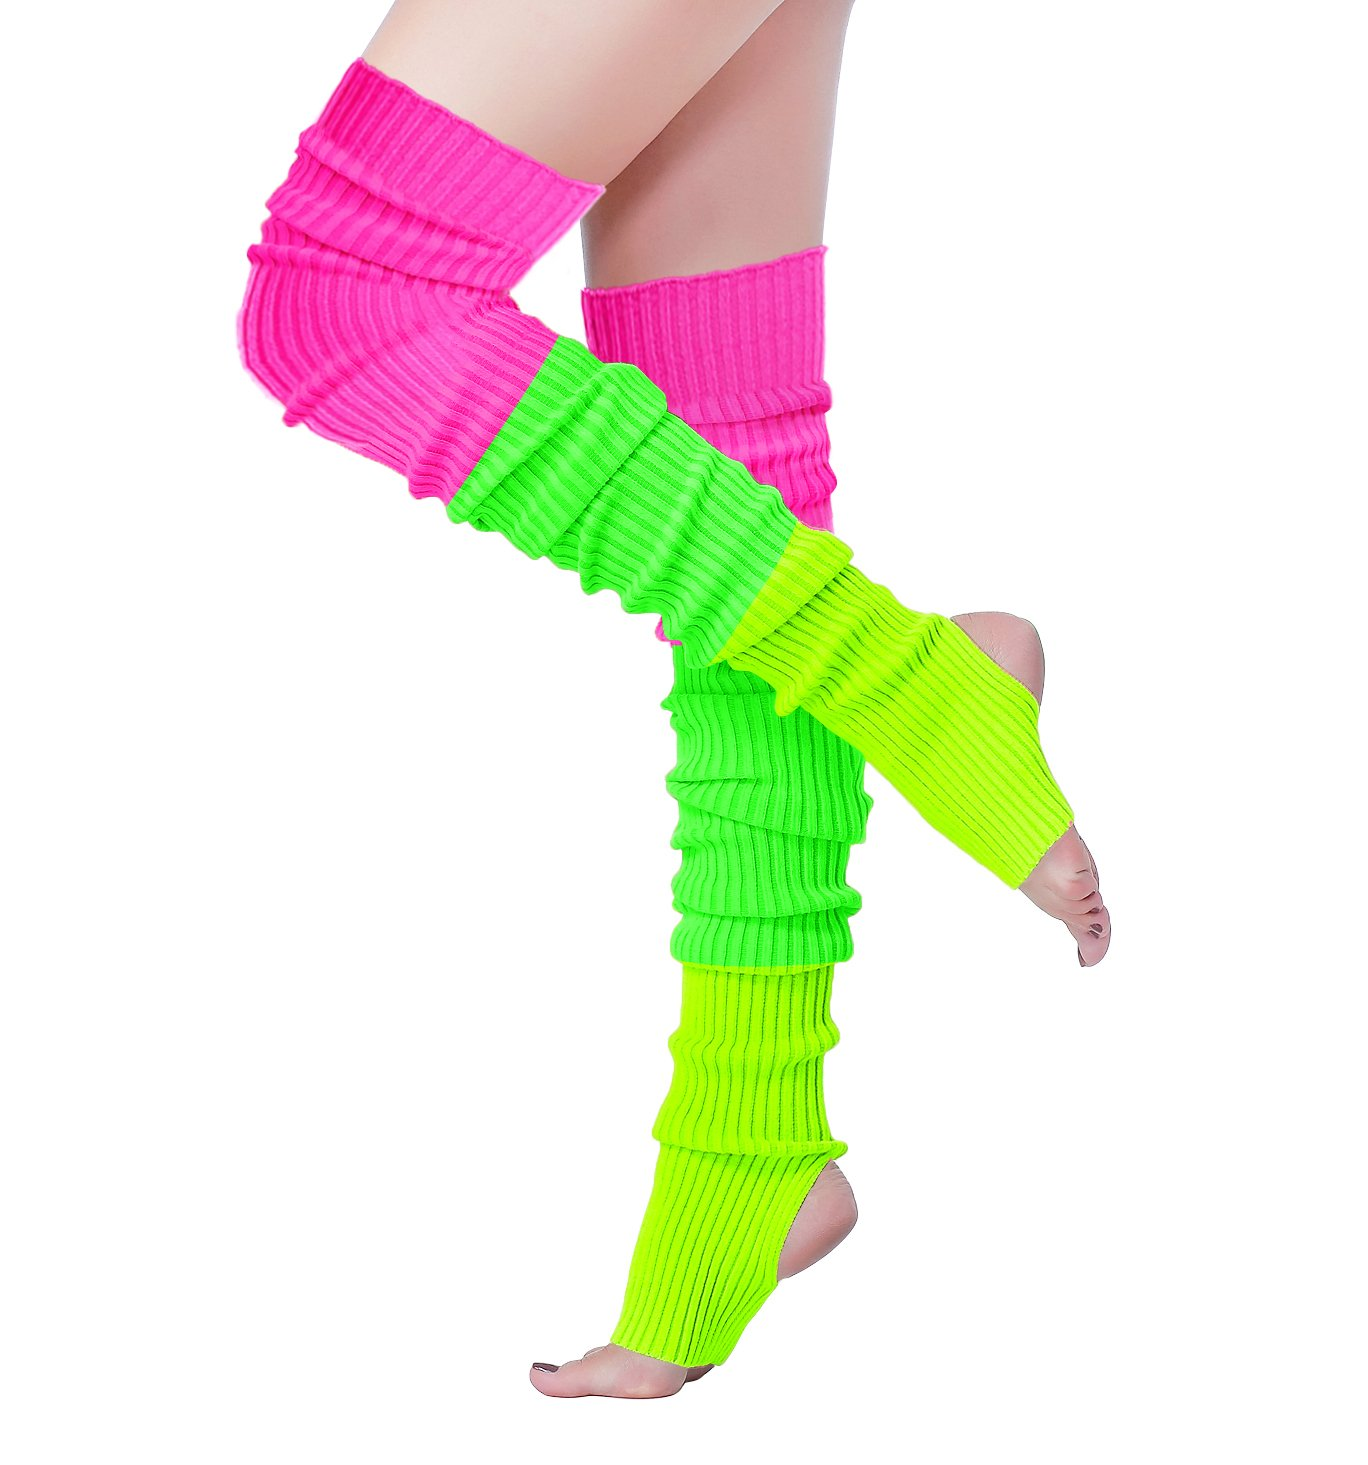 V28 Women 80s Ribbed Knit Stirrup Neon Dance Sports Yoga Long Leg Warmers(One Size, THole80-Mix3D)